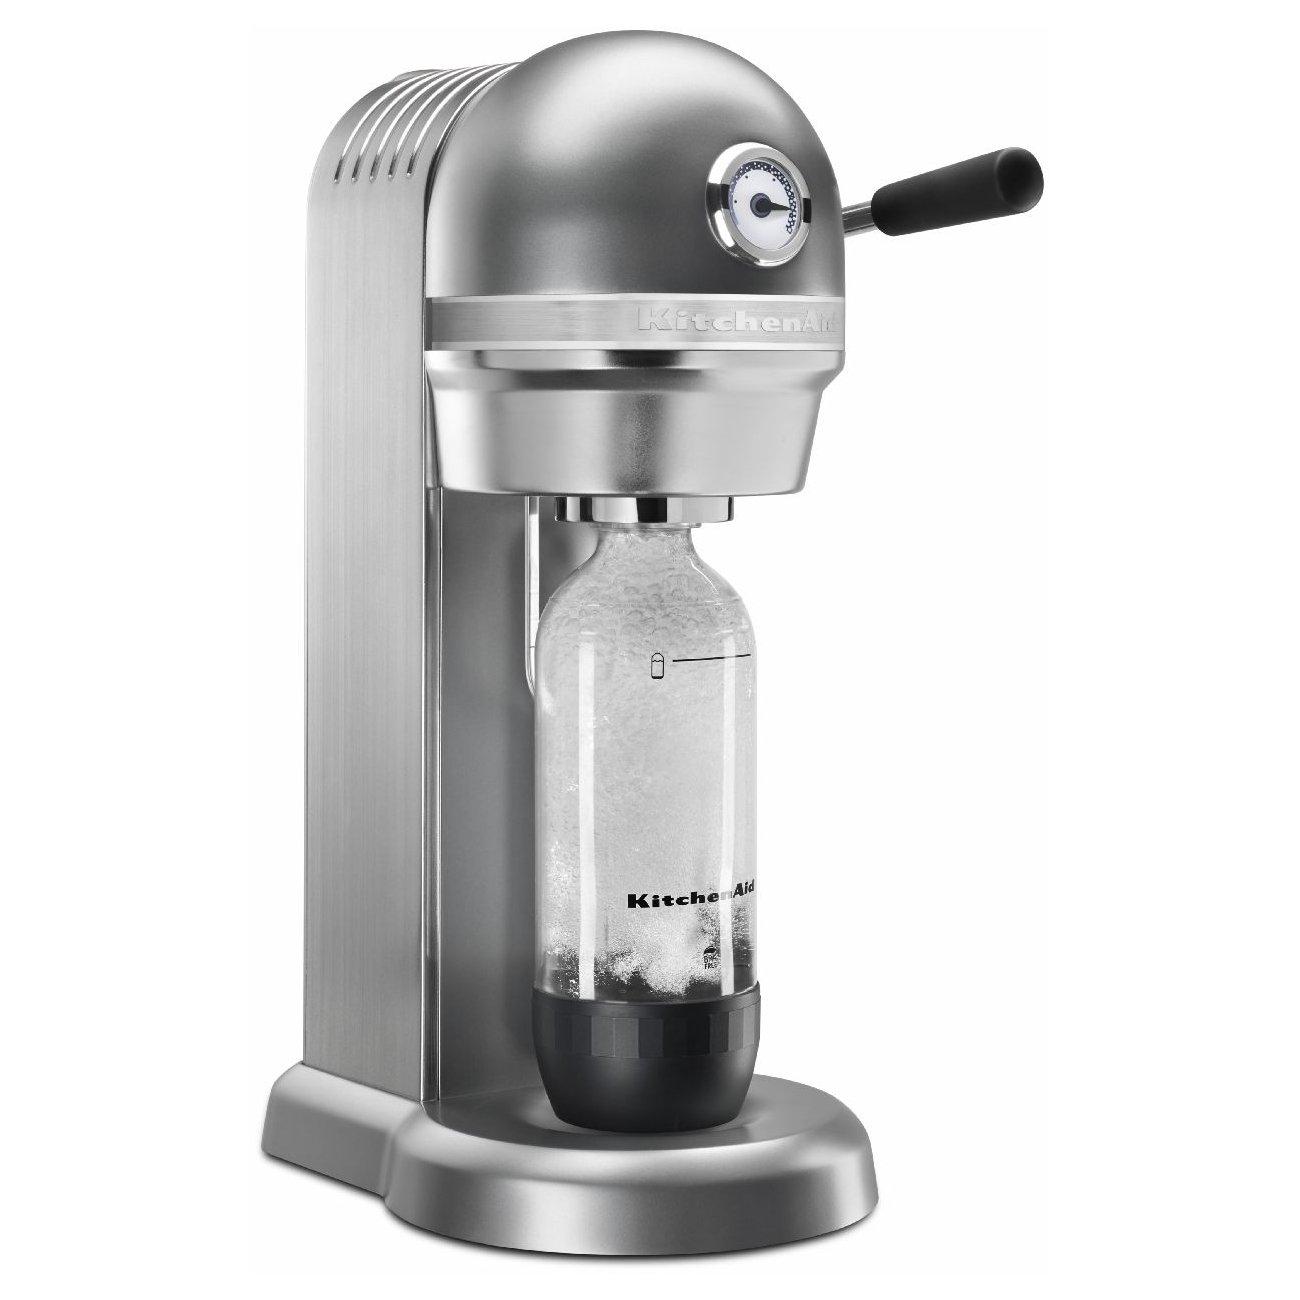 KitchenAid KSS1121CU Sparkling Beverage Maker, Contour Silver by KitchenAid